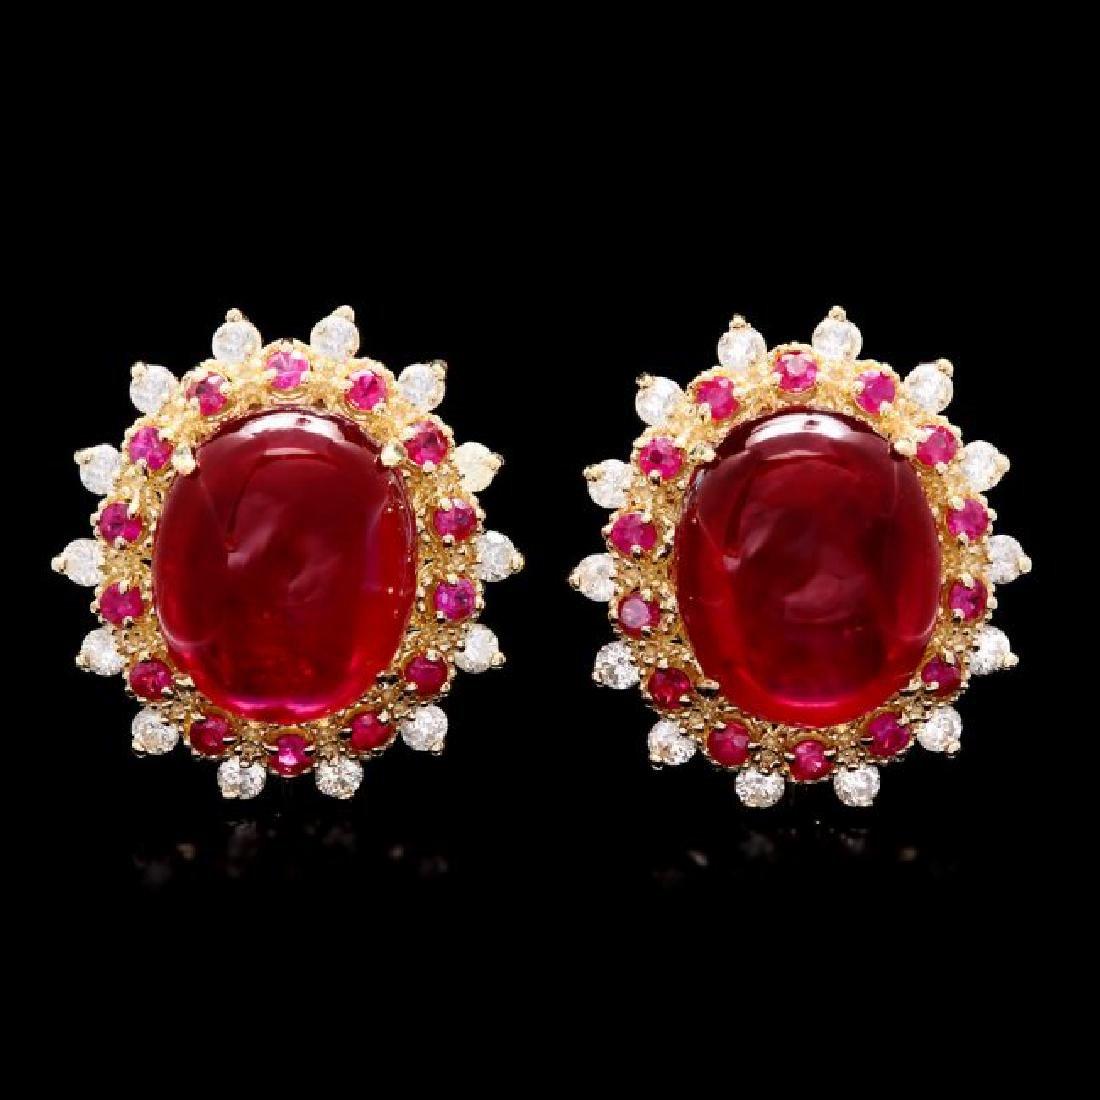 14k Gold 16.65ct Ruby 0.80ct Diamond Earrings